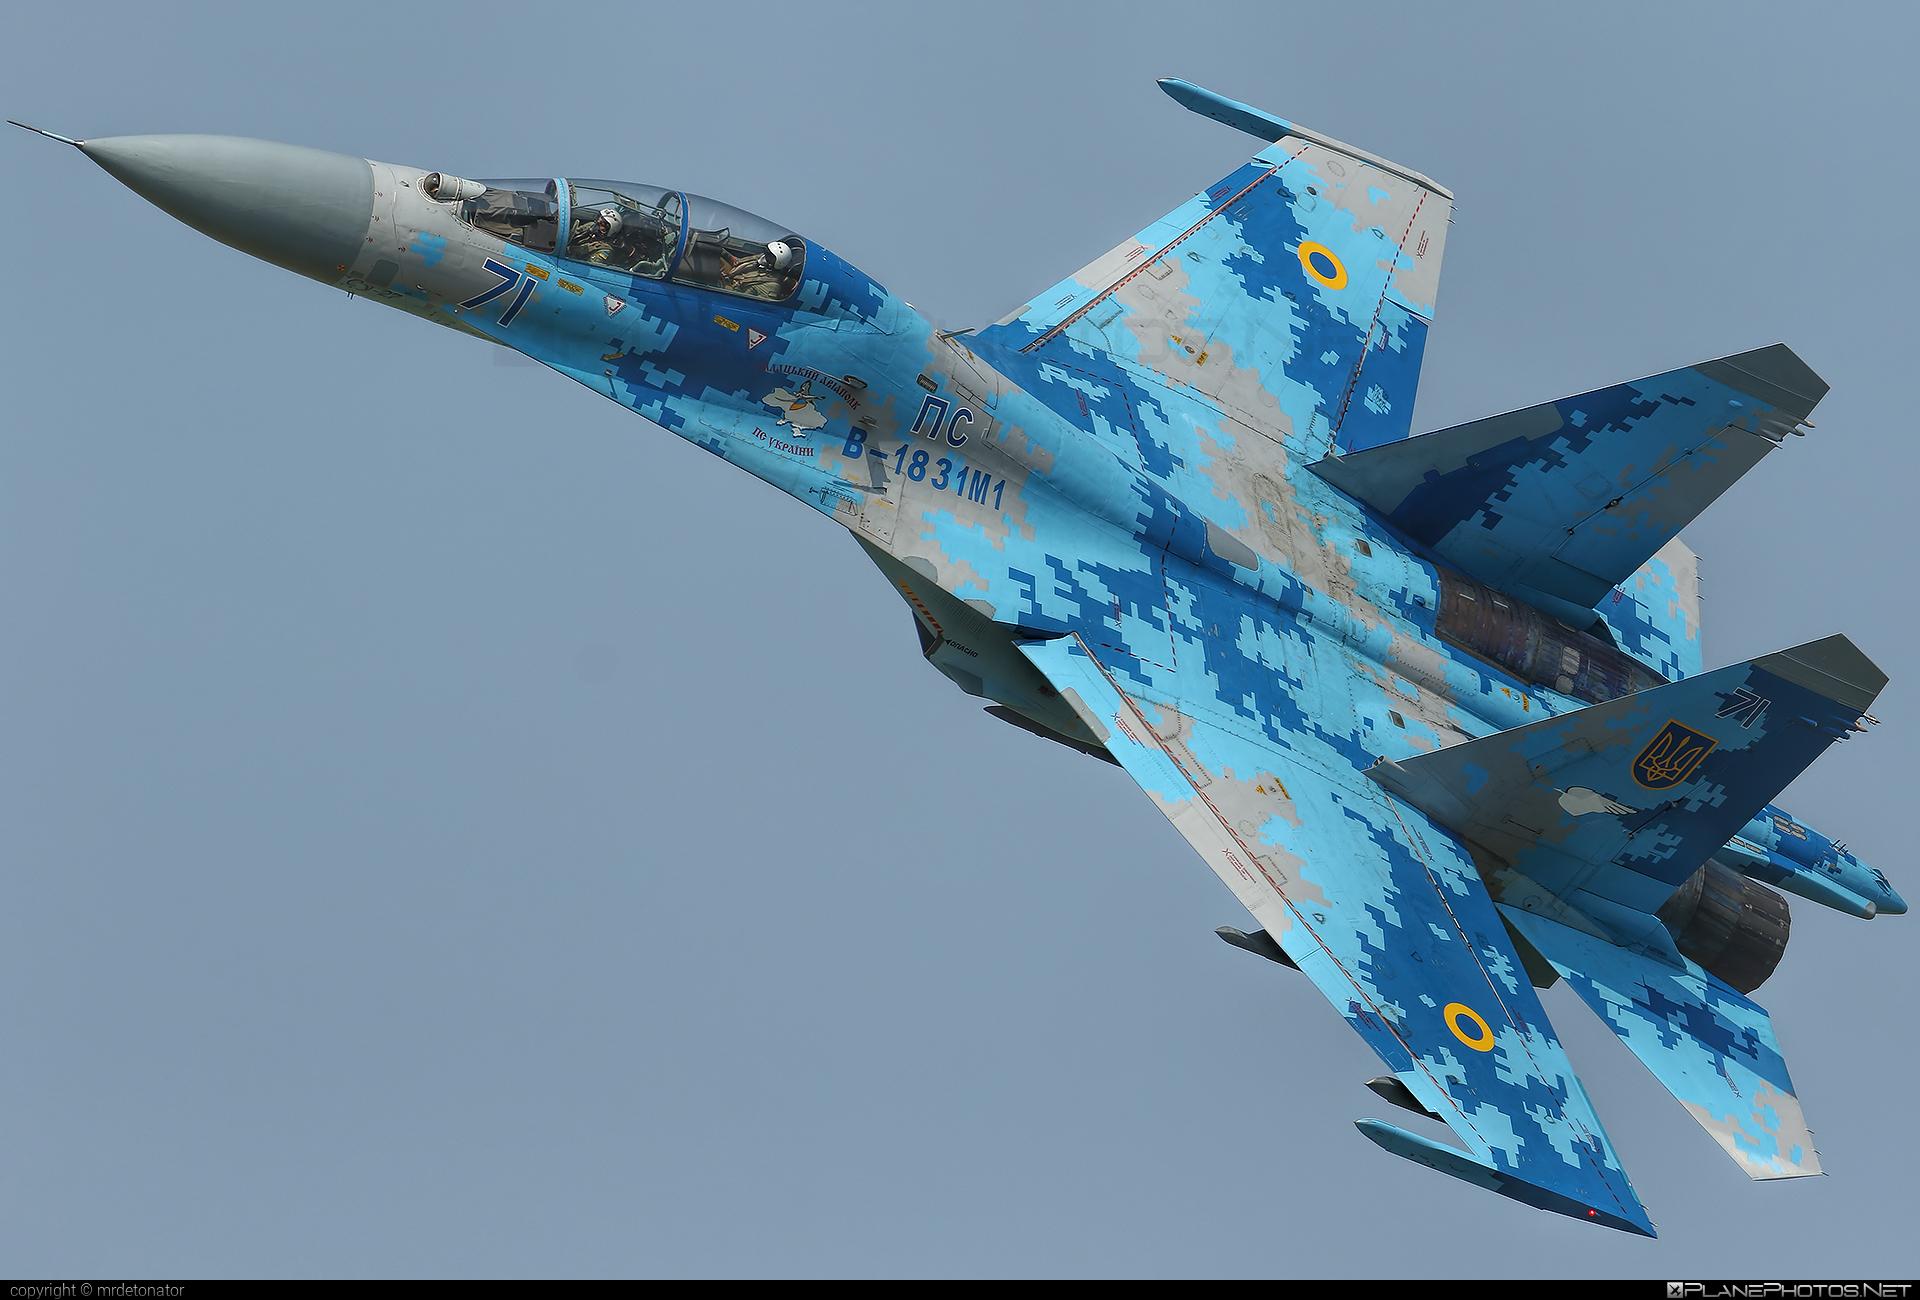 Sukhoi Su-27UB - 71 operated by Povitryani Syly Ukrayiny (Ukrainian Air Force) #povitryanisylyukrayiny #radomairshow #radomairshow2018 #su27 #su27ub #sukhoi #sukhoi27 #ukrainianairforce